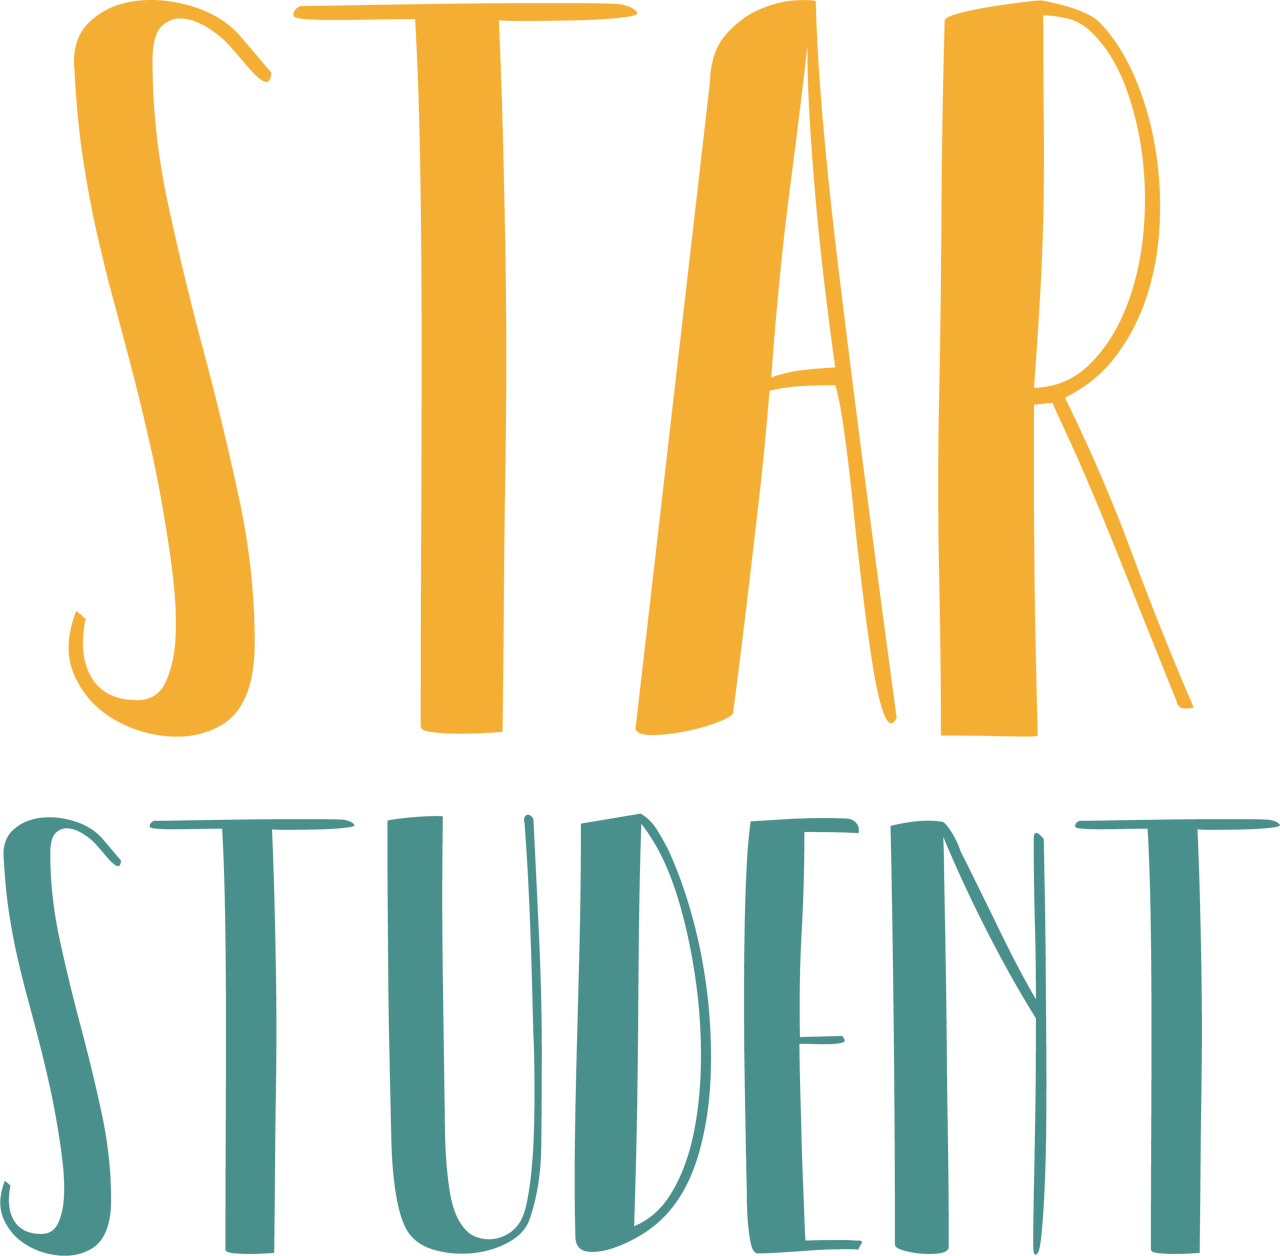 Star Student SVG Cut File